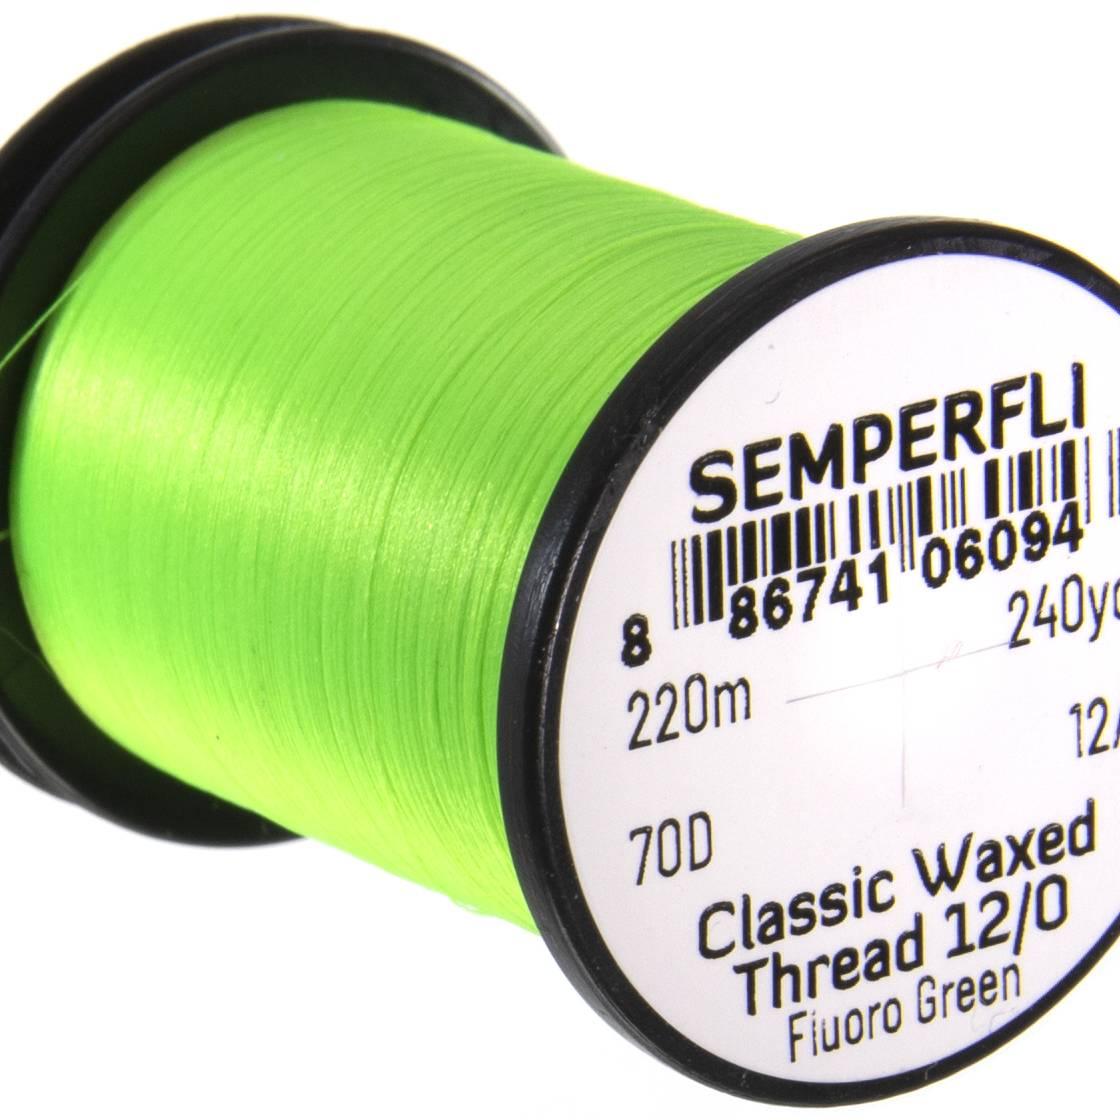 Semperfli Classic Waxed Thread 12/0 240 Yards Fluoro Green